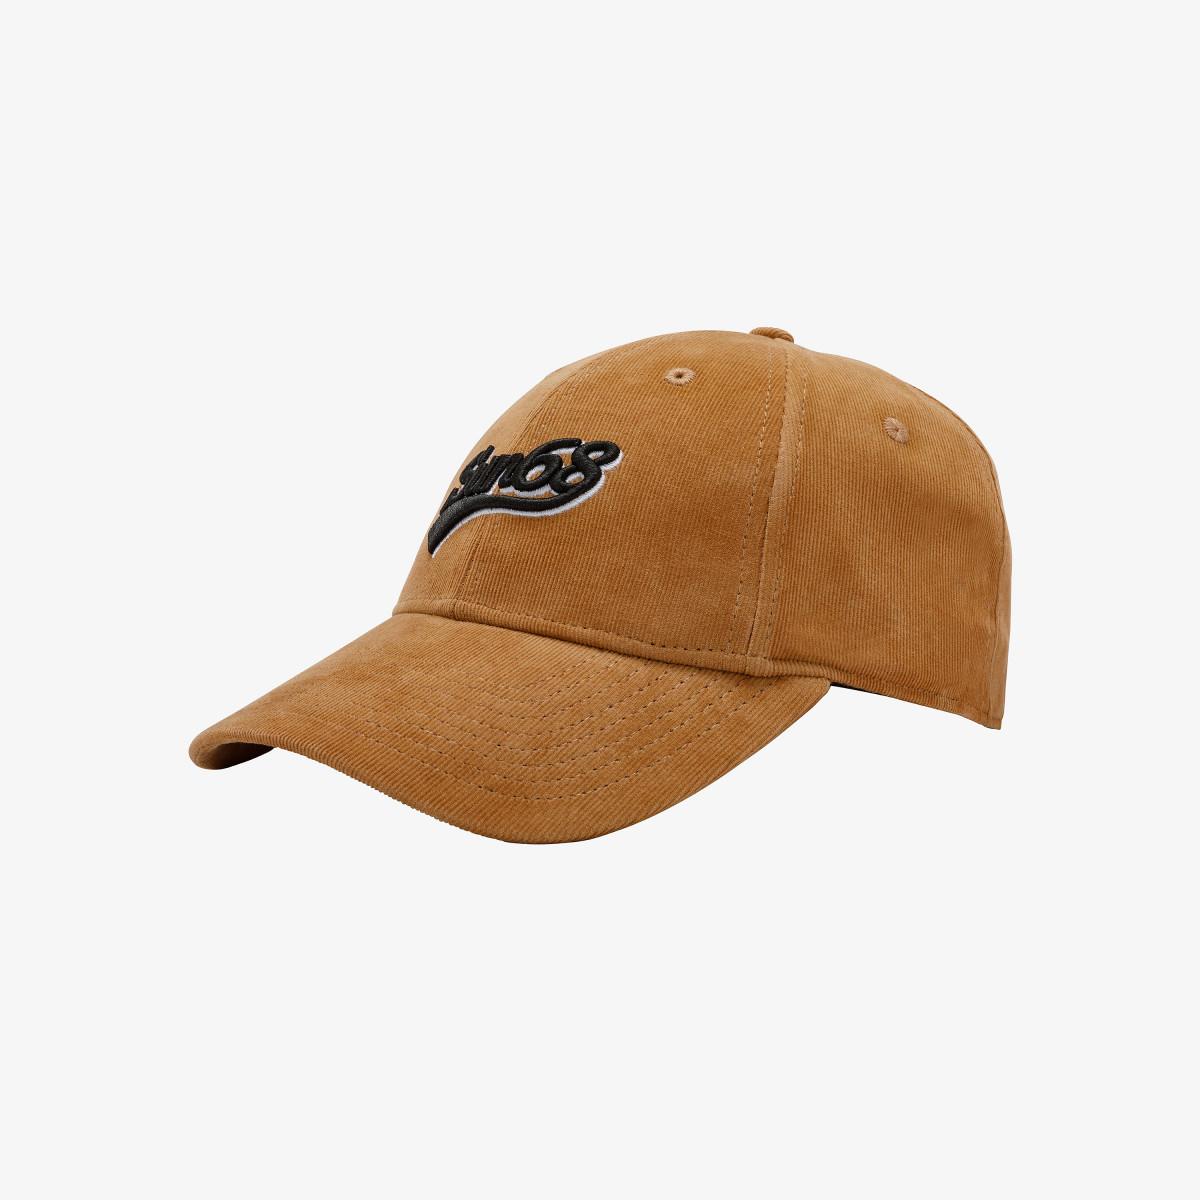 BASEBALL CAP CORDUROY BEIGE